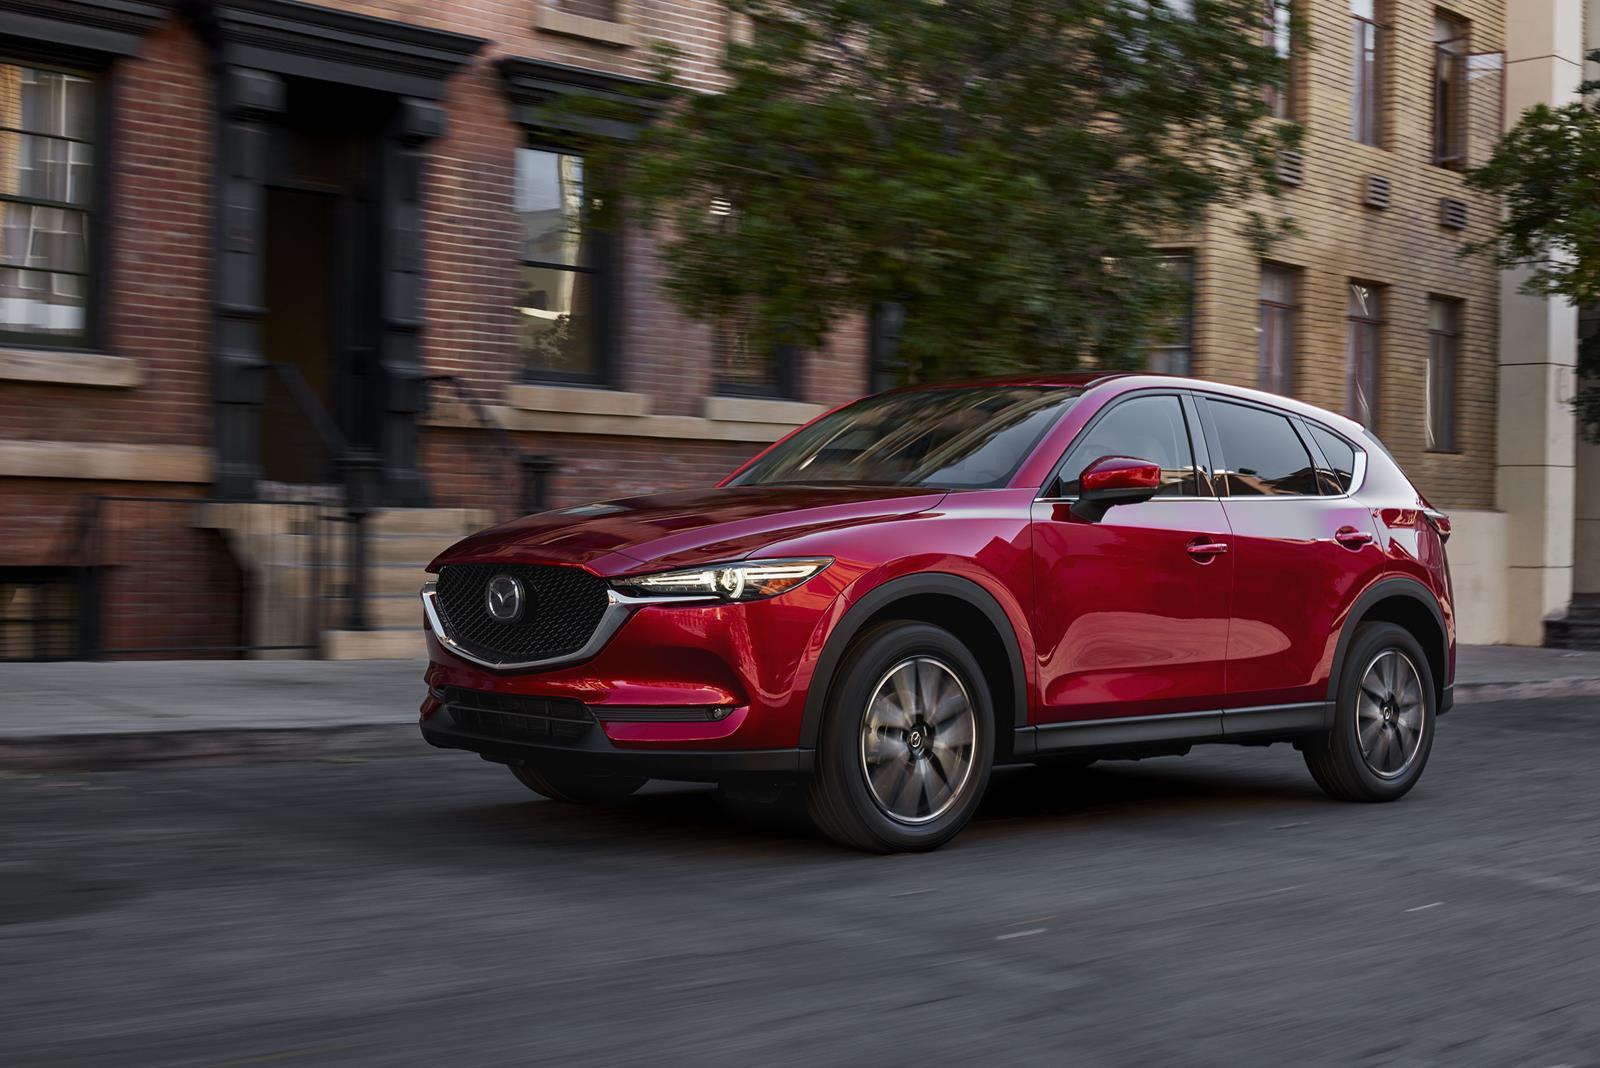 Mazda CX-5 2017 — фотогалерея кроссовера